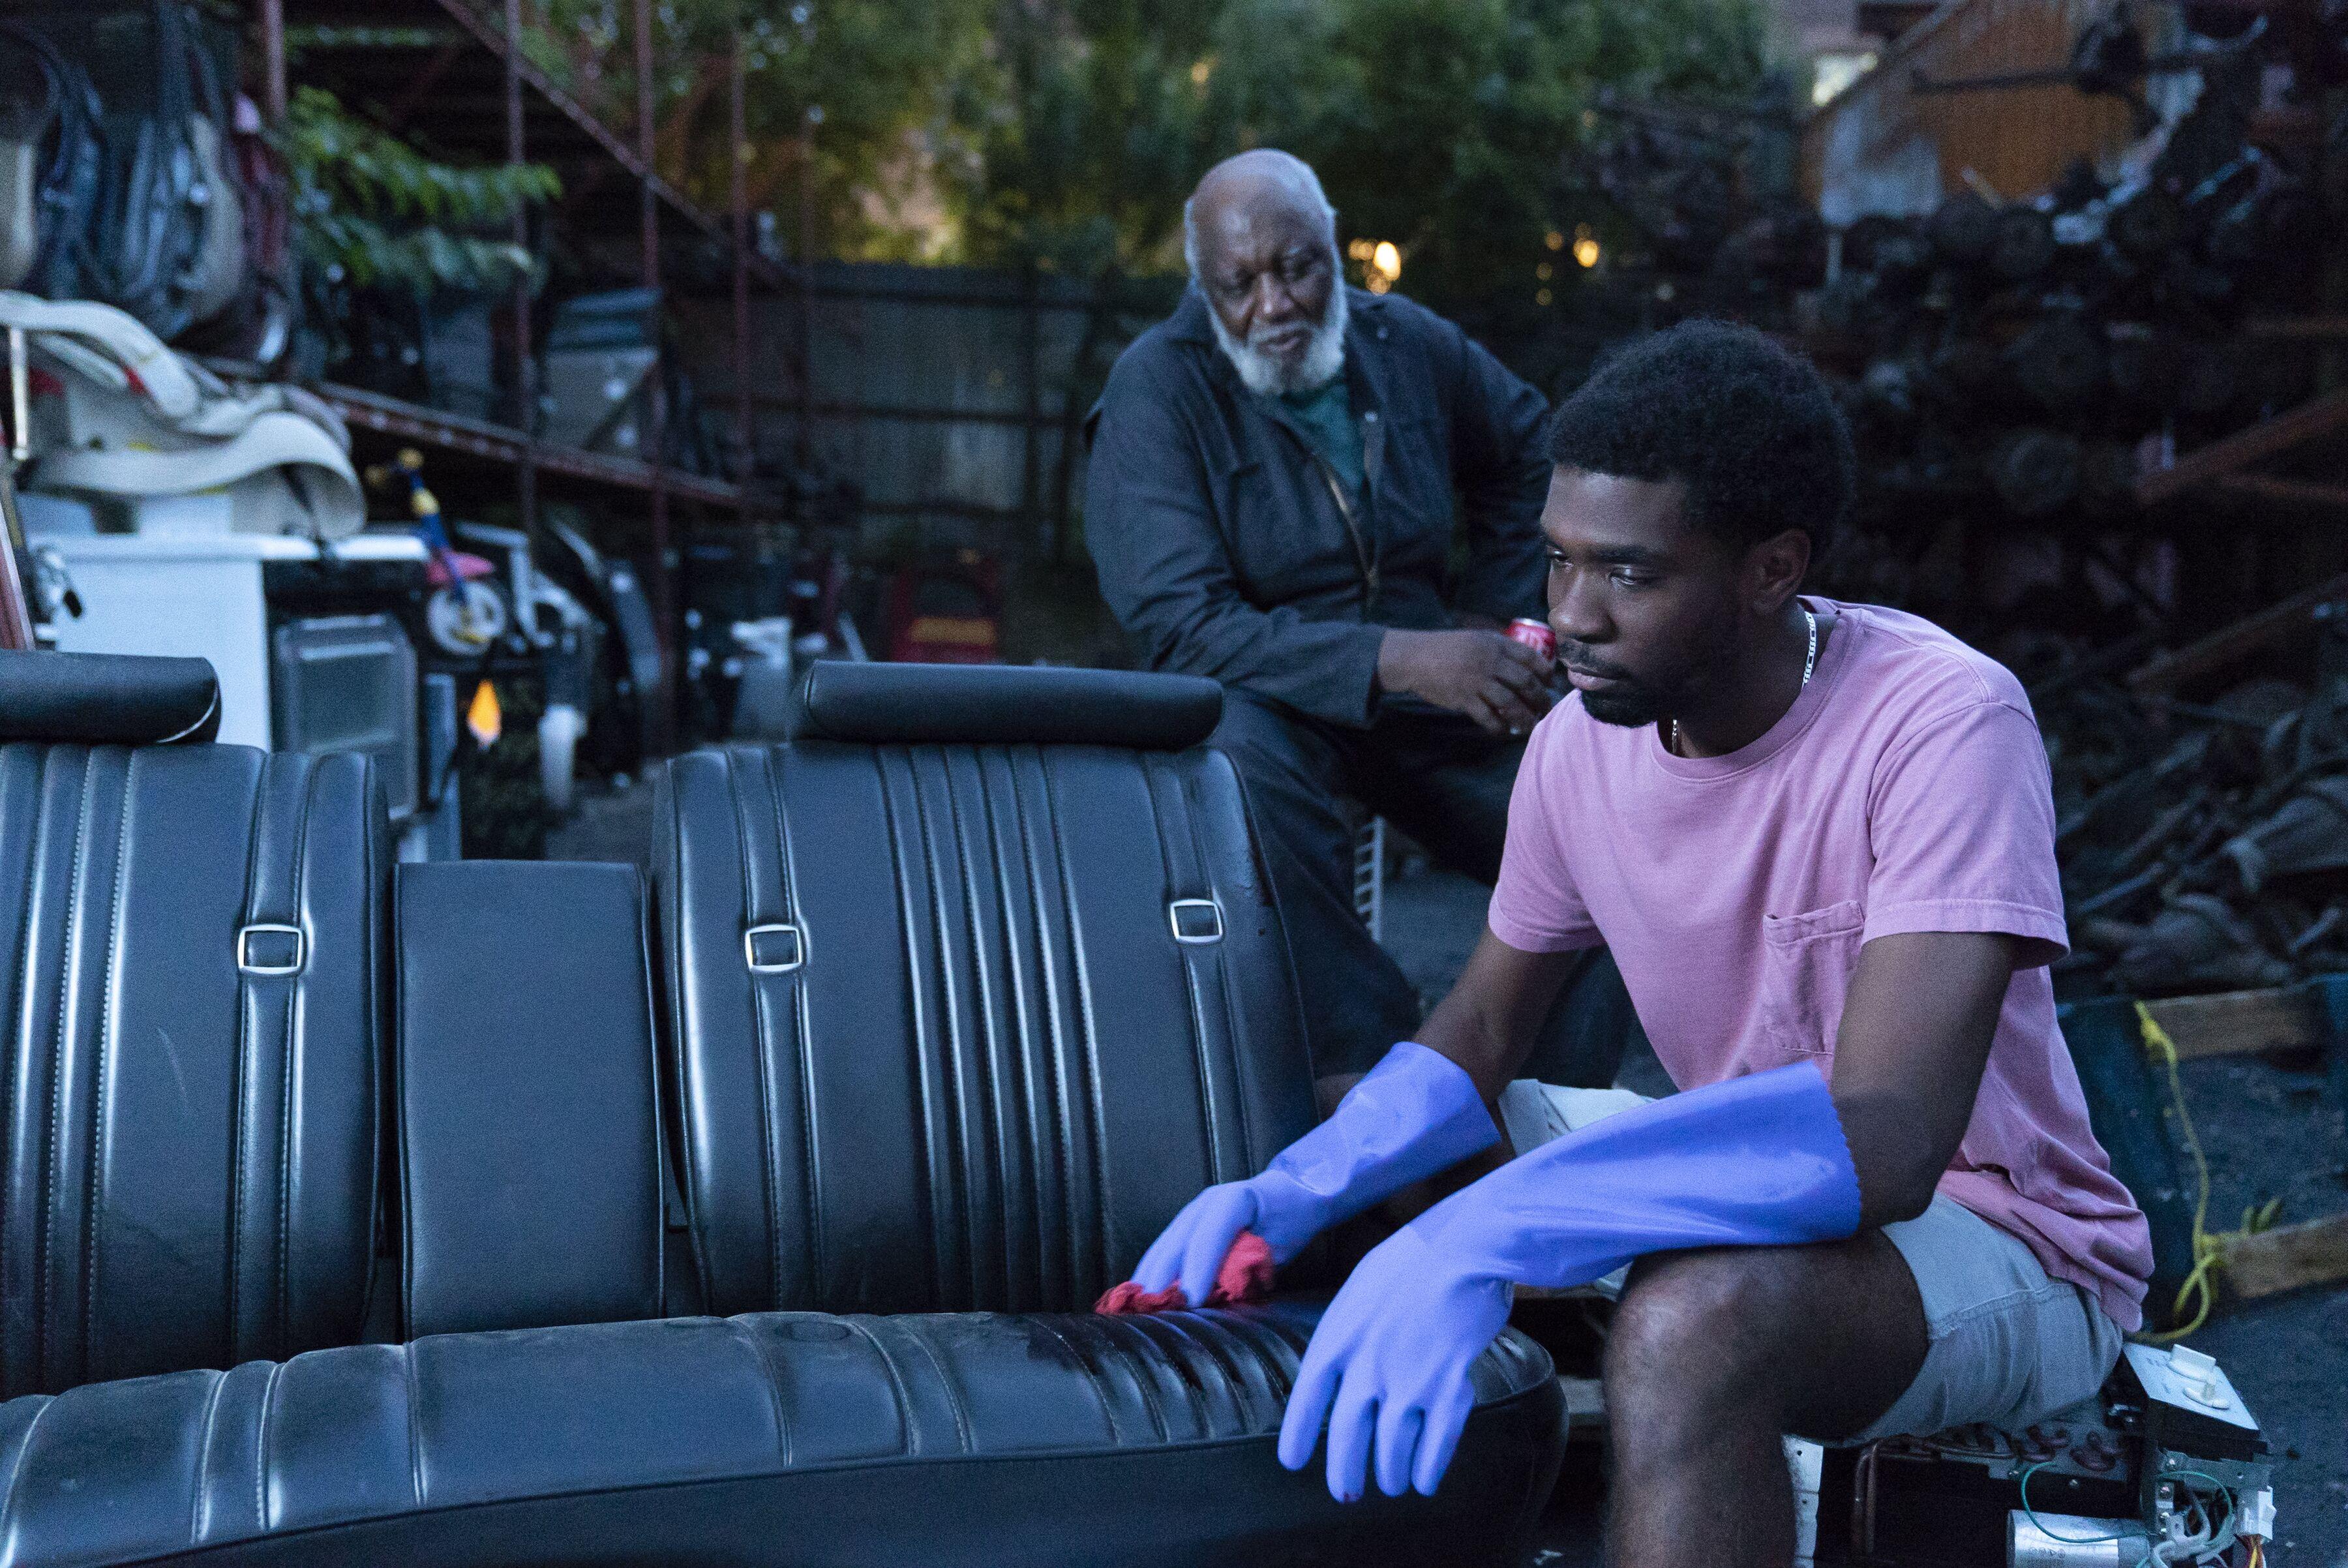 High Maintenance Season 3 Episode 2 recap: Craig